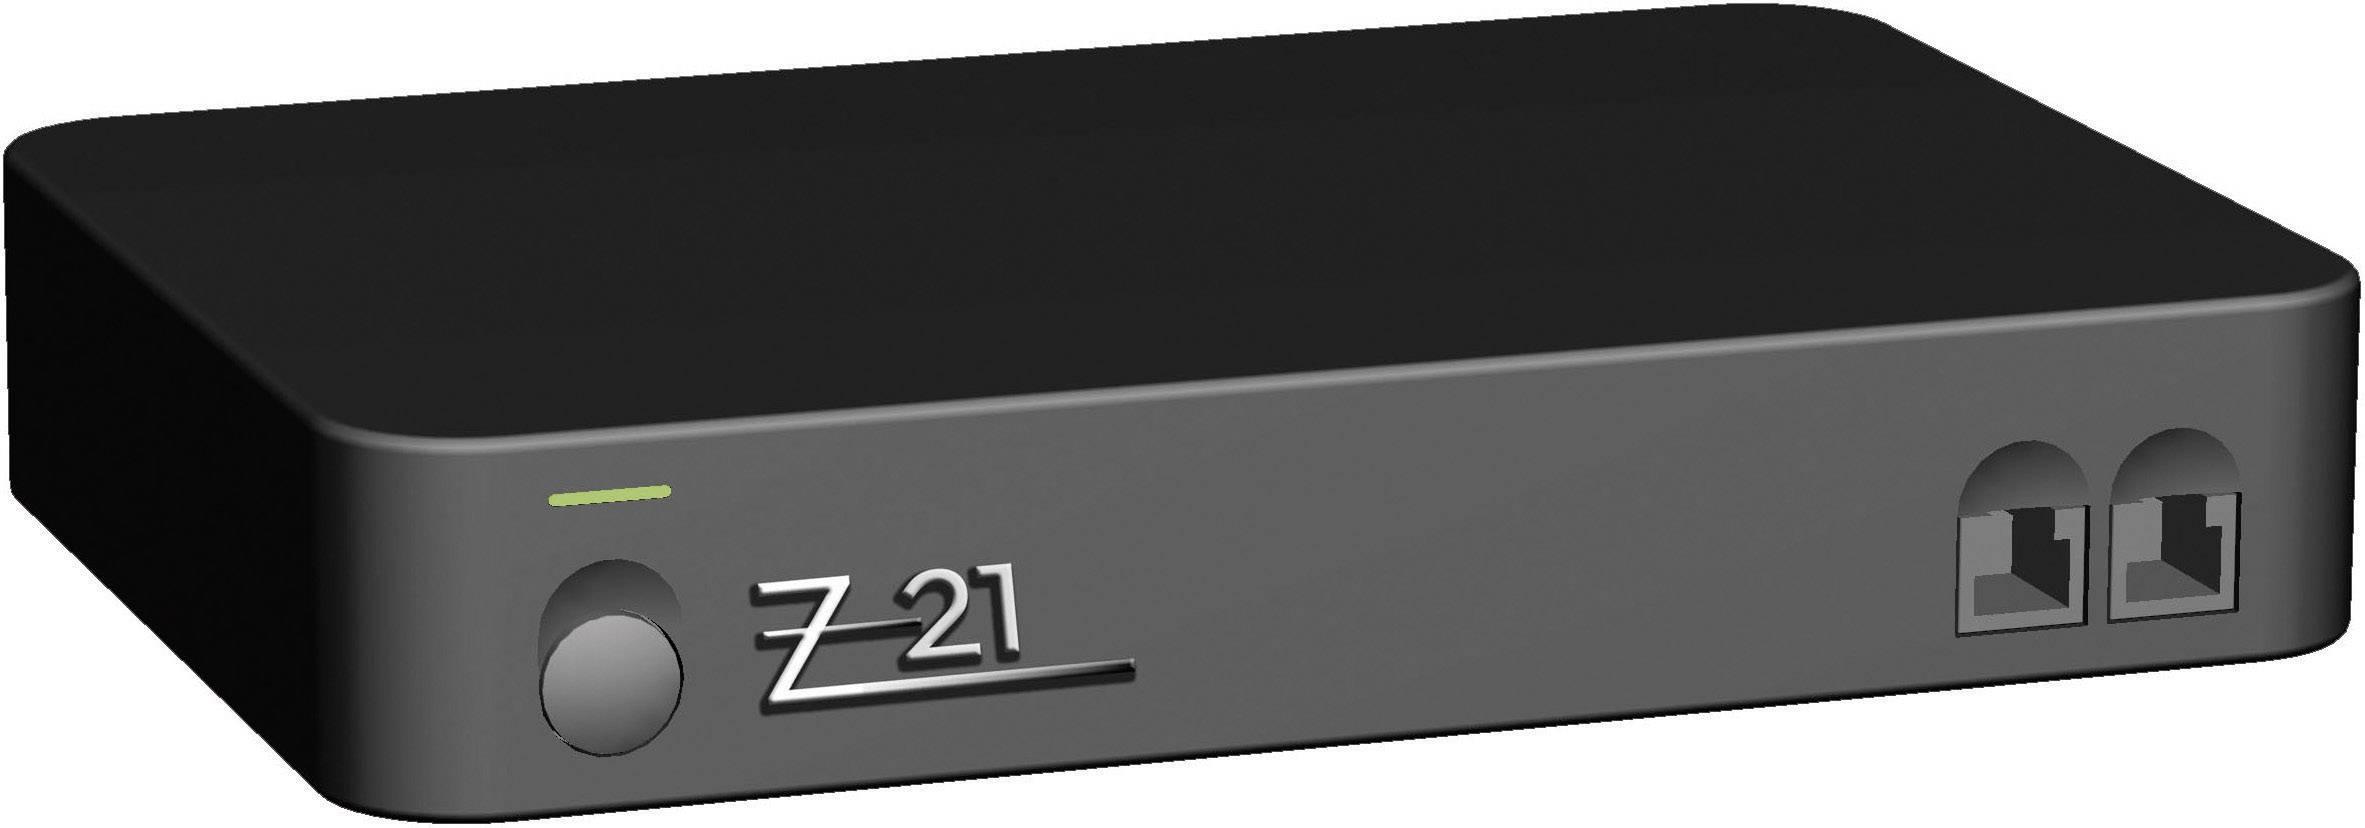 Fangsack passend f/ür Arebos AR-HE-E3000 TOP CRAFT TVB 2500